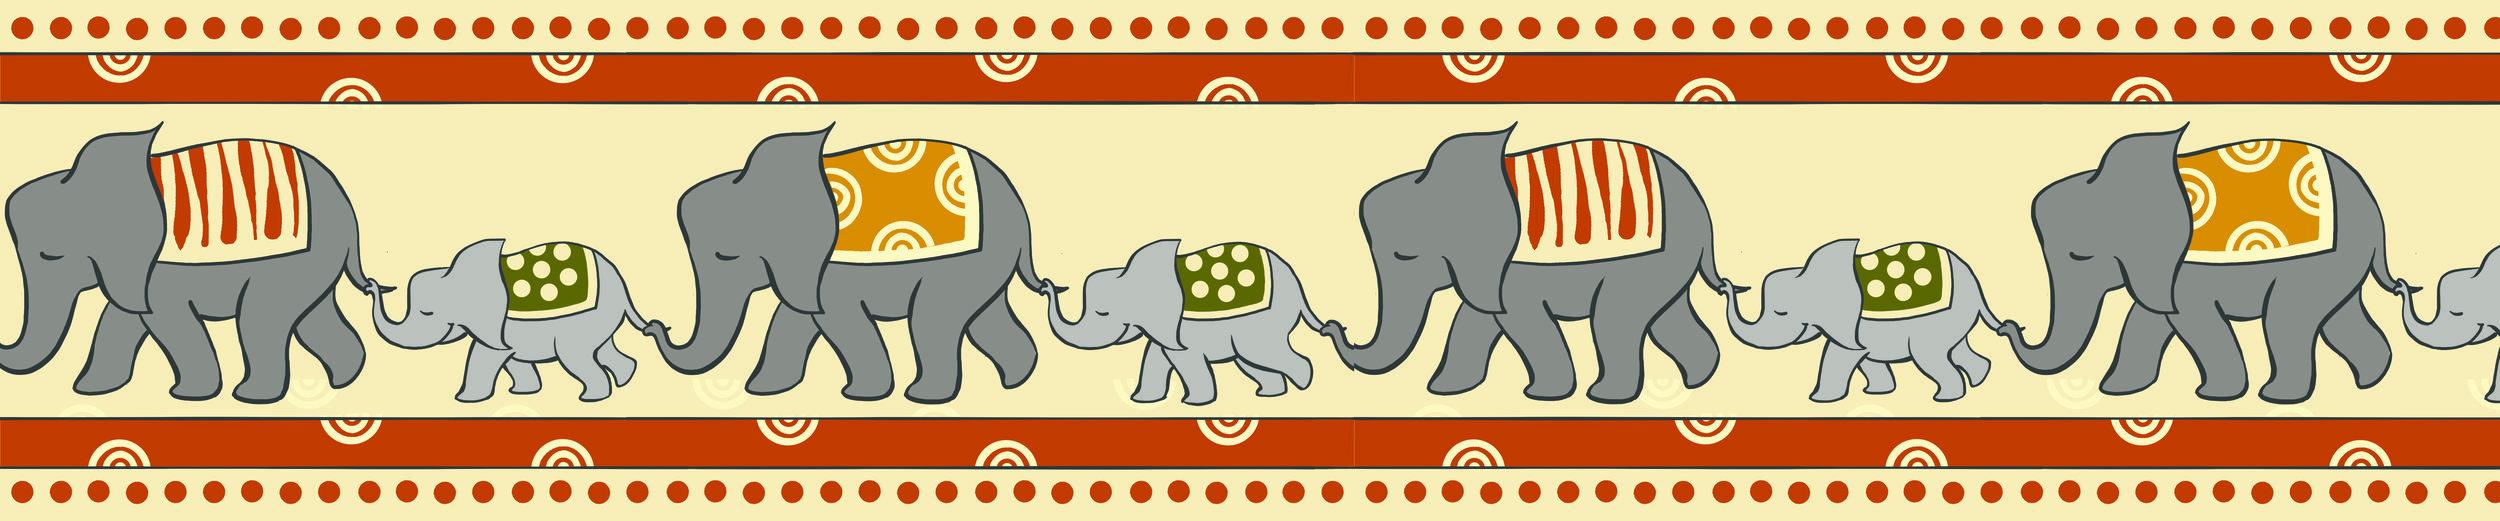 ElephantsMarching_Border_Final.jpg